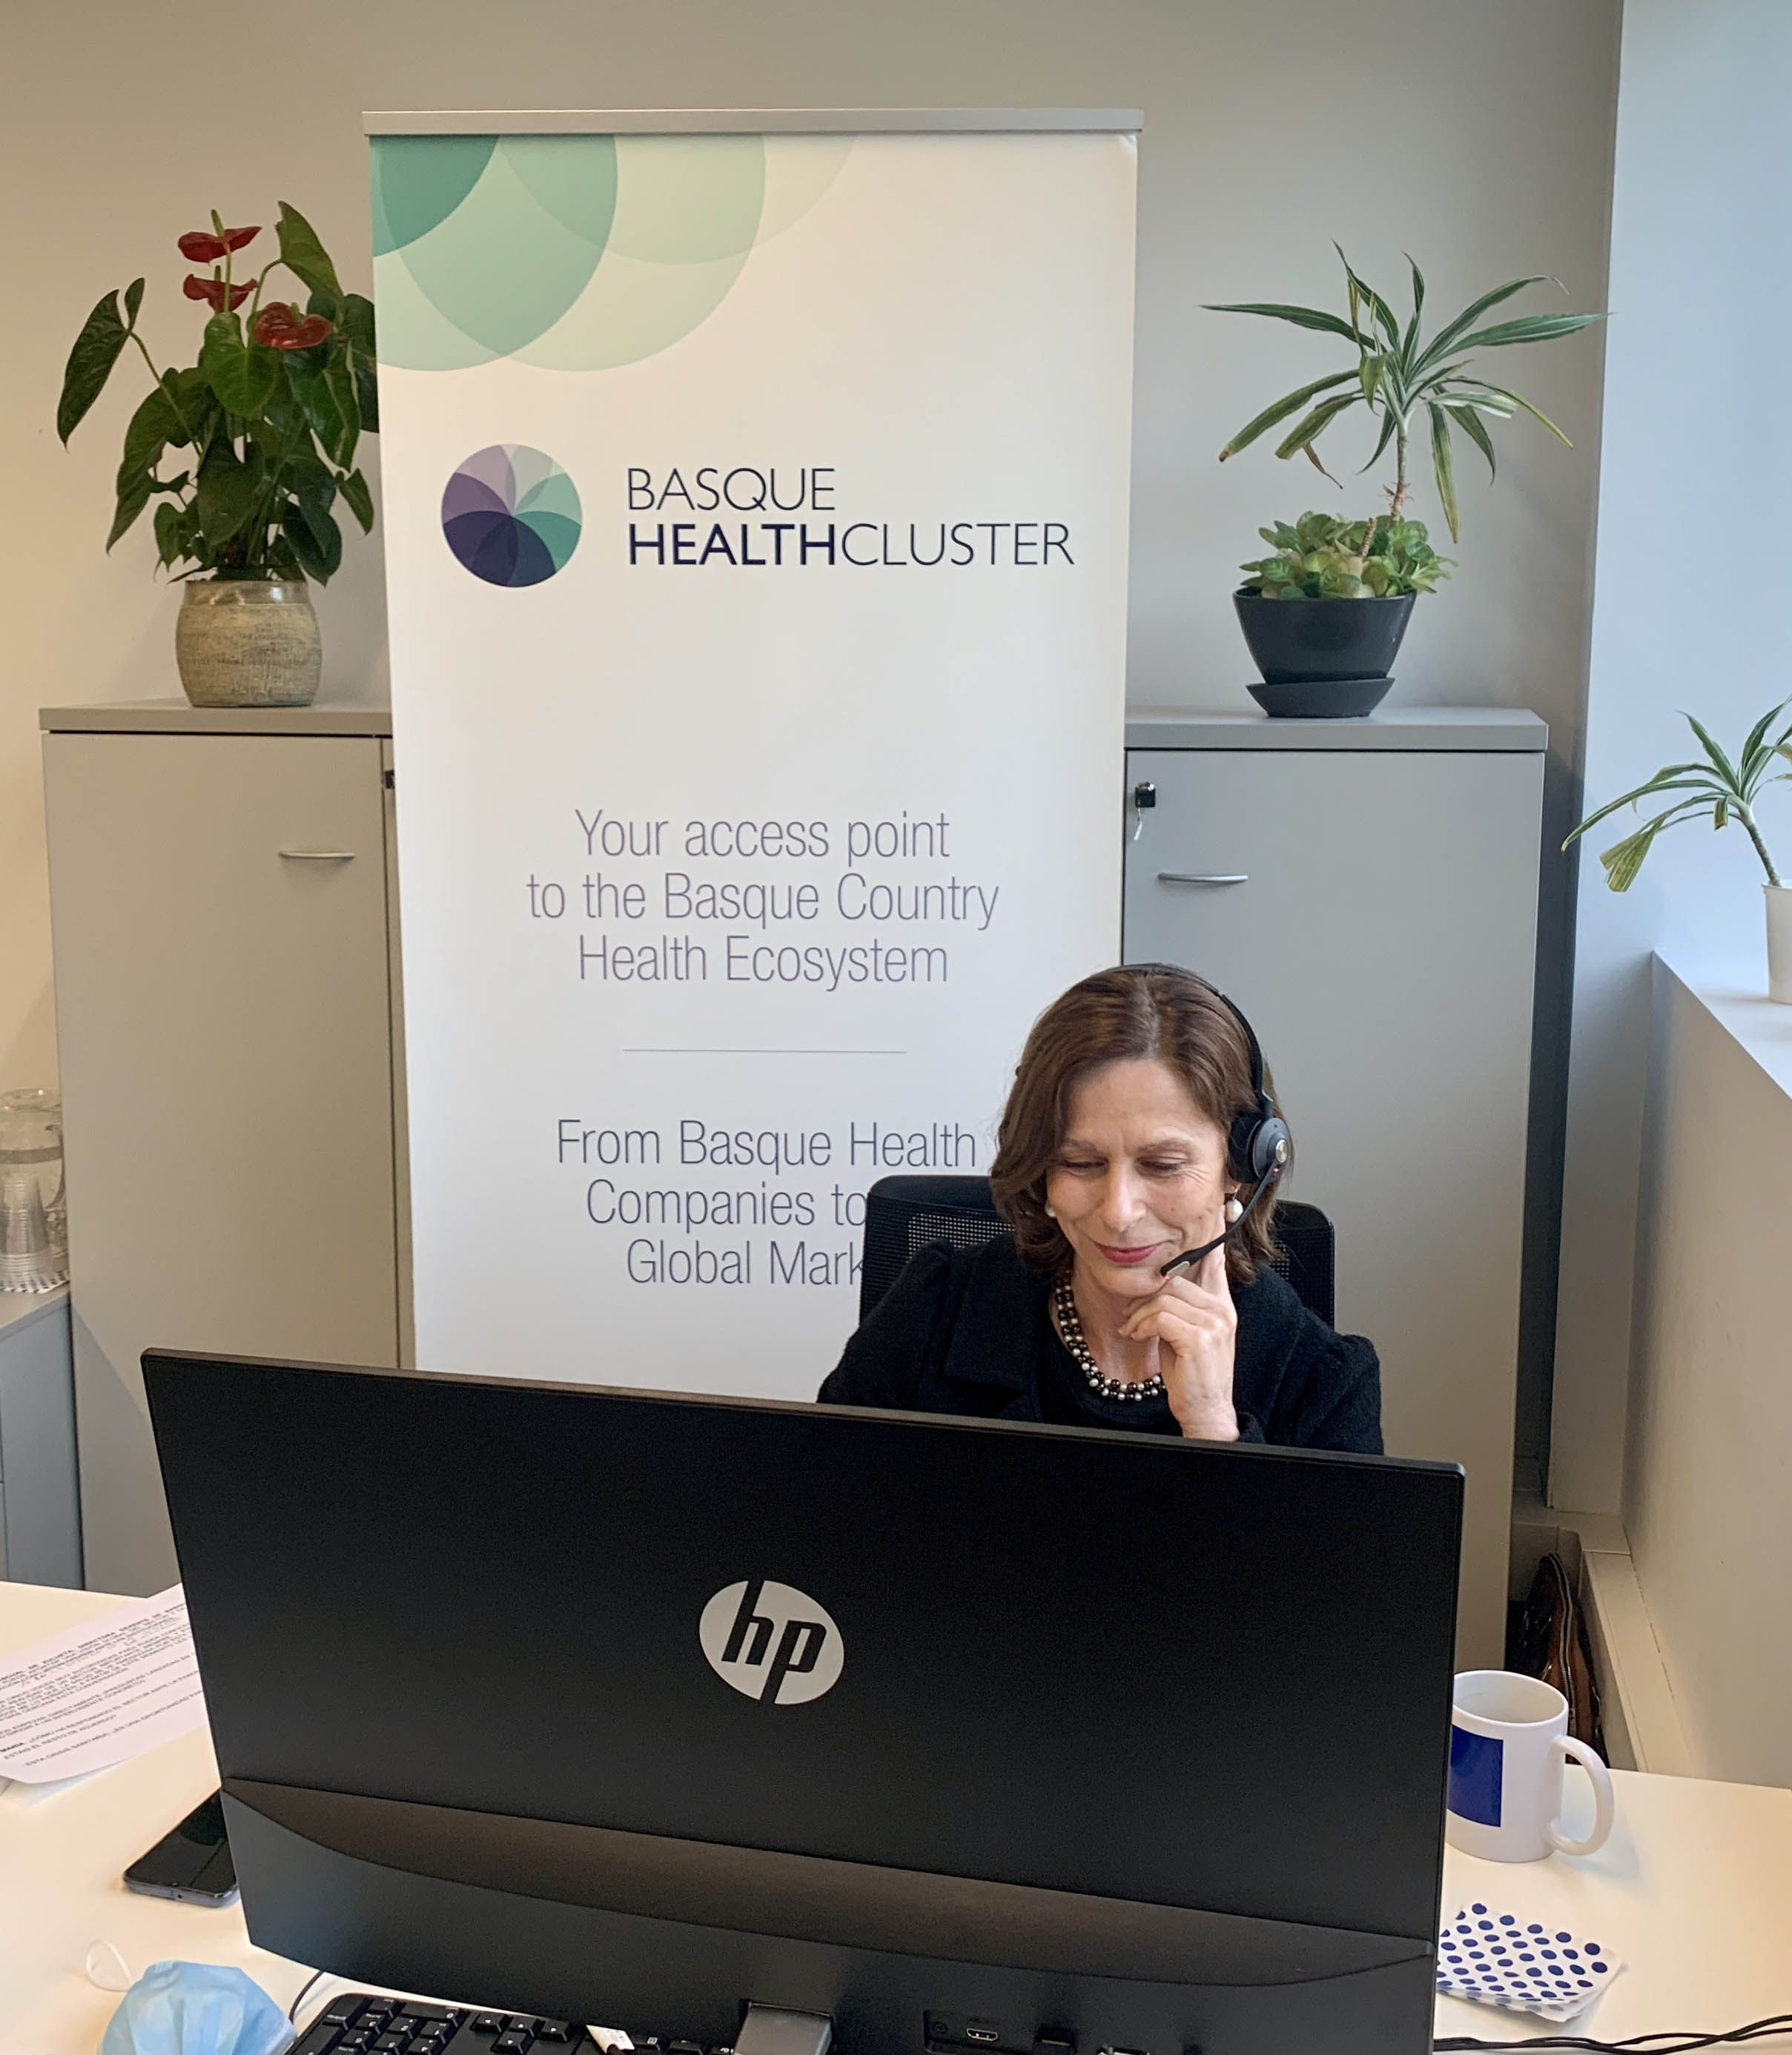 Basque Health Cluster